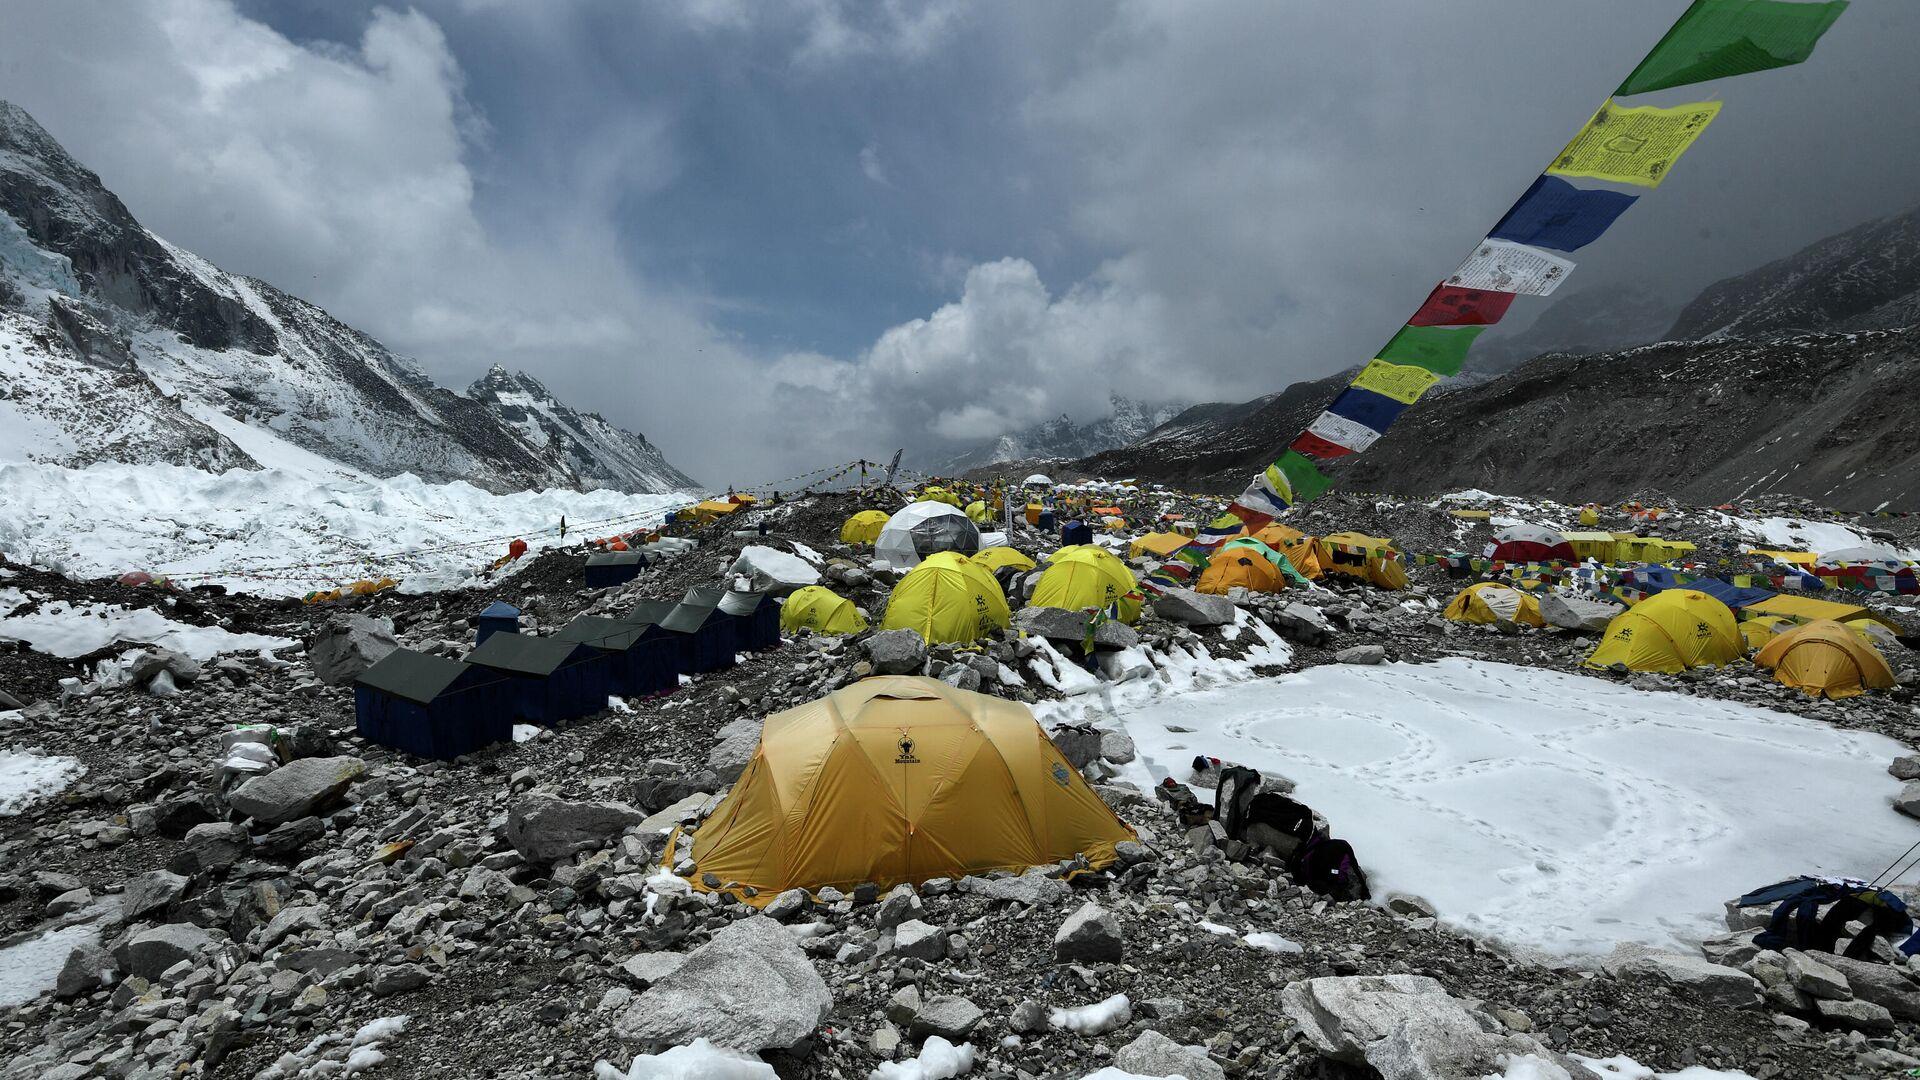 Campamento de ascenso al Everest - Sputnik Mundo, 1920, 05.05.2021